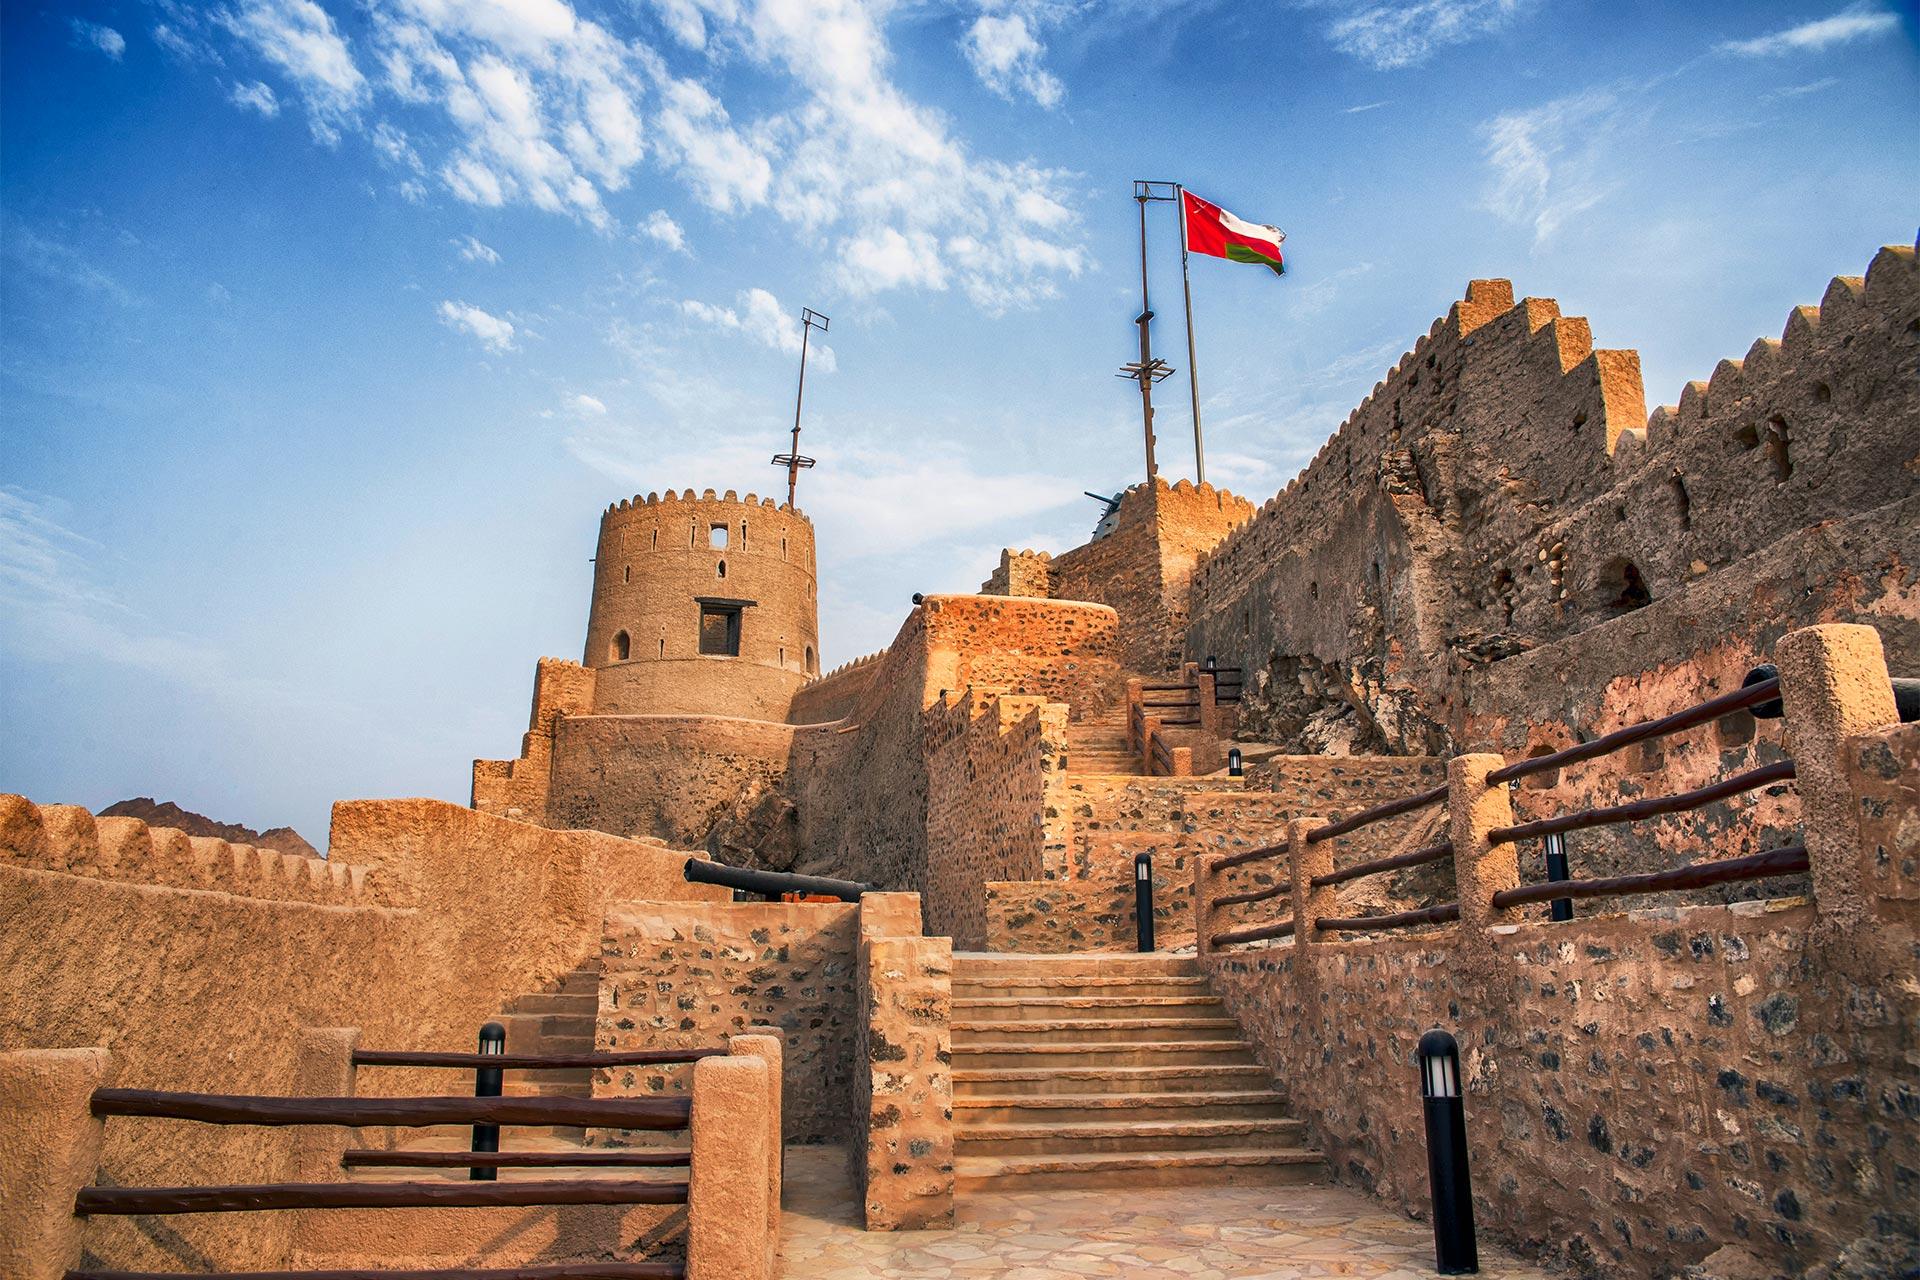 Oman - Mountains, Fortresses & Desert